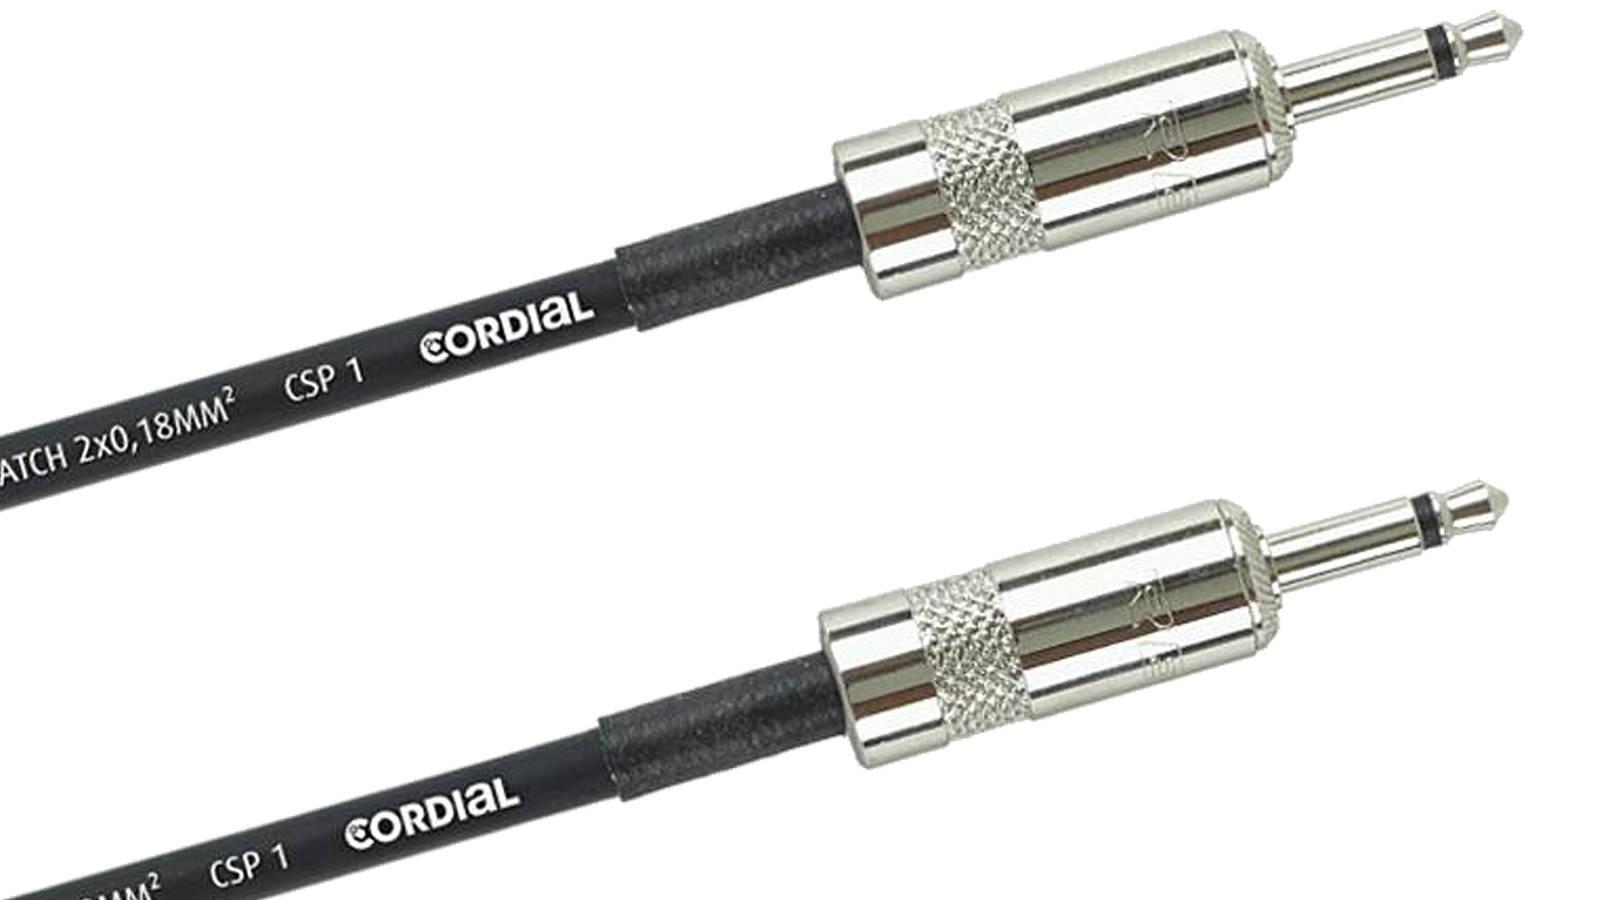 Cordial CPI 0,9 ZZ Patchkabel für Modularsysteme mKL-mKL 90 cm